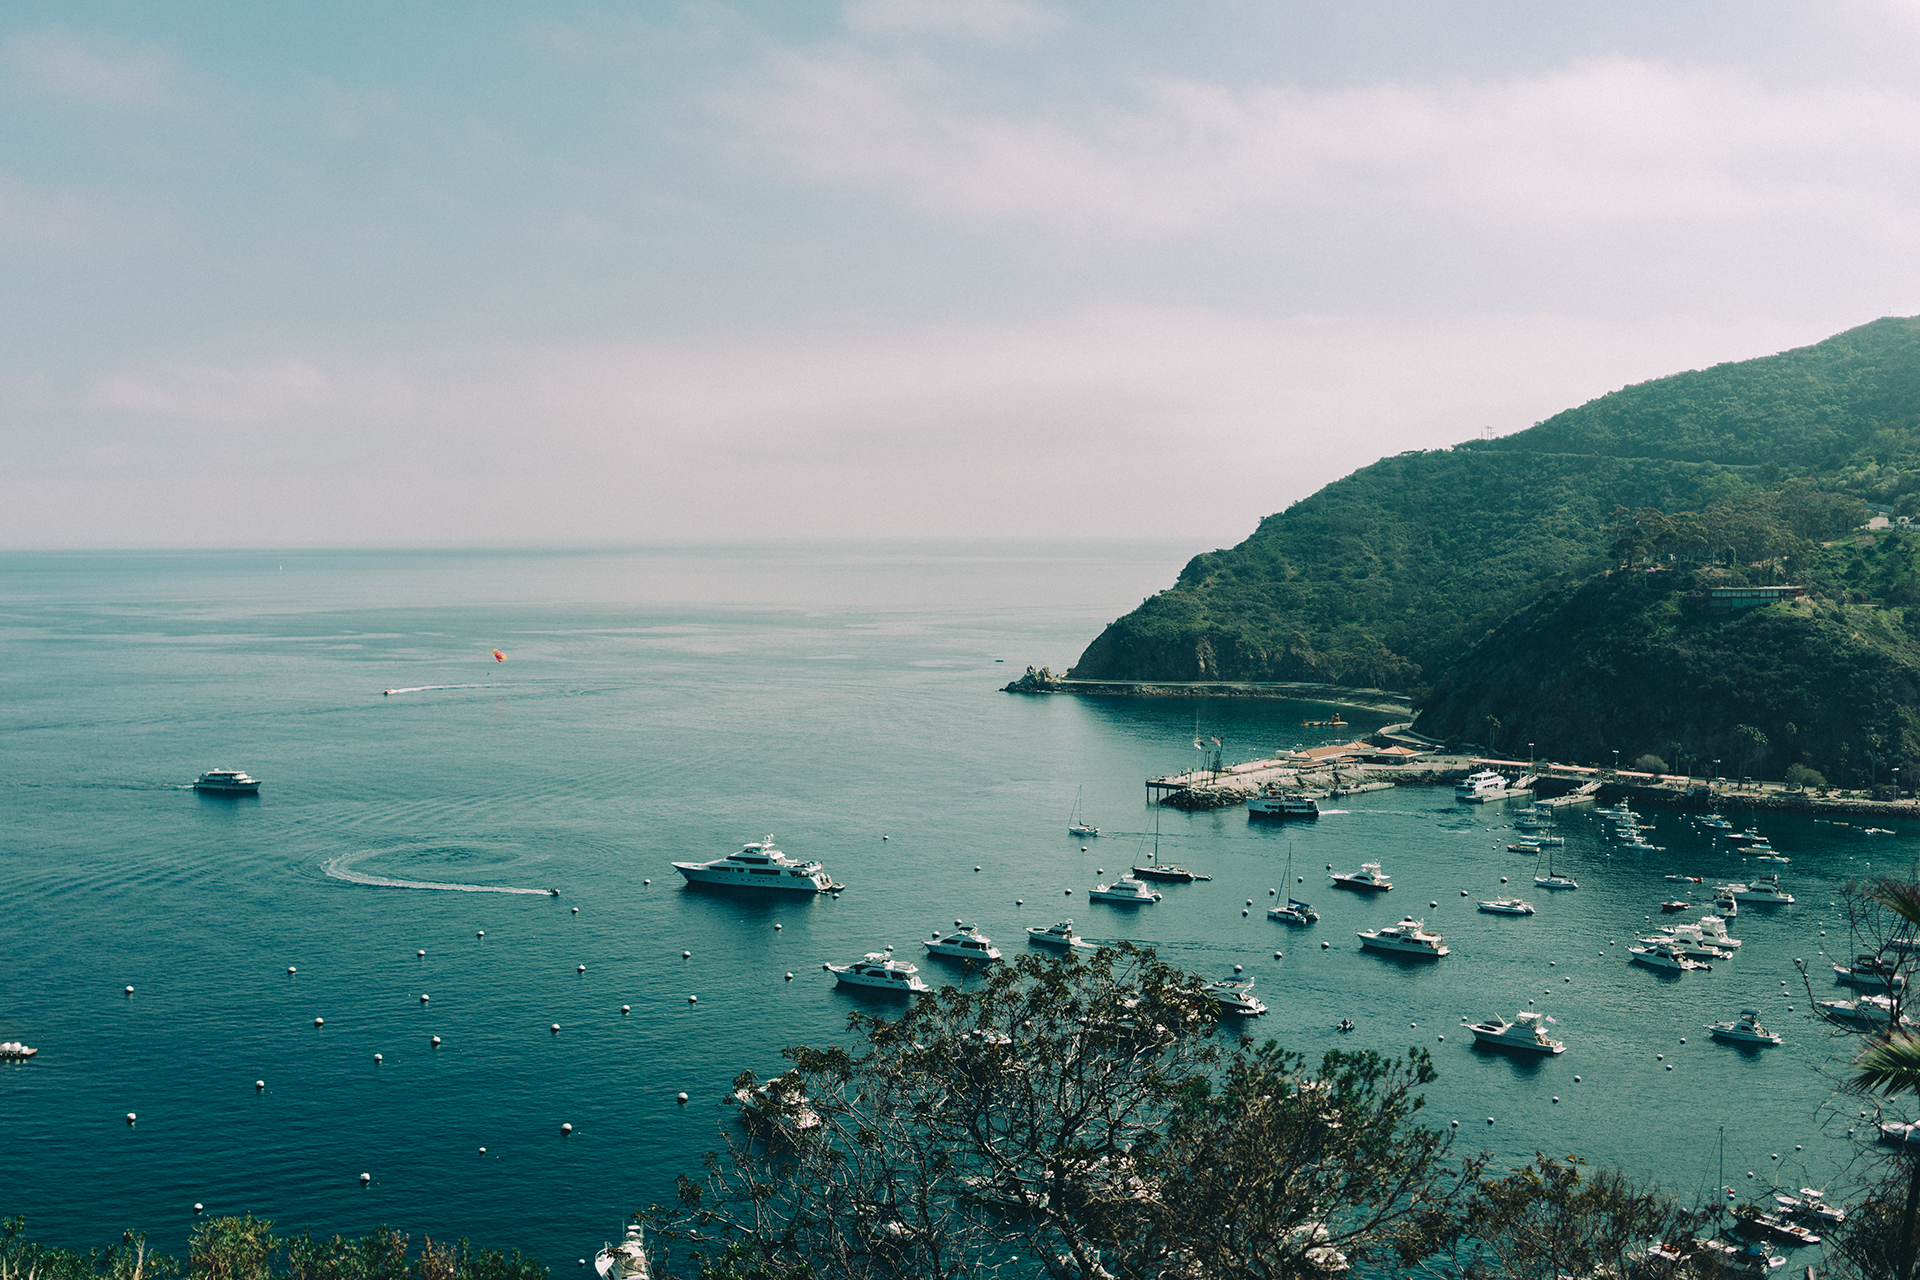 bay boats port-yachts